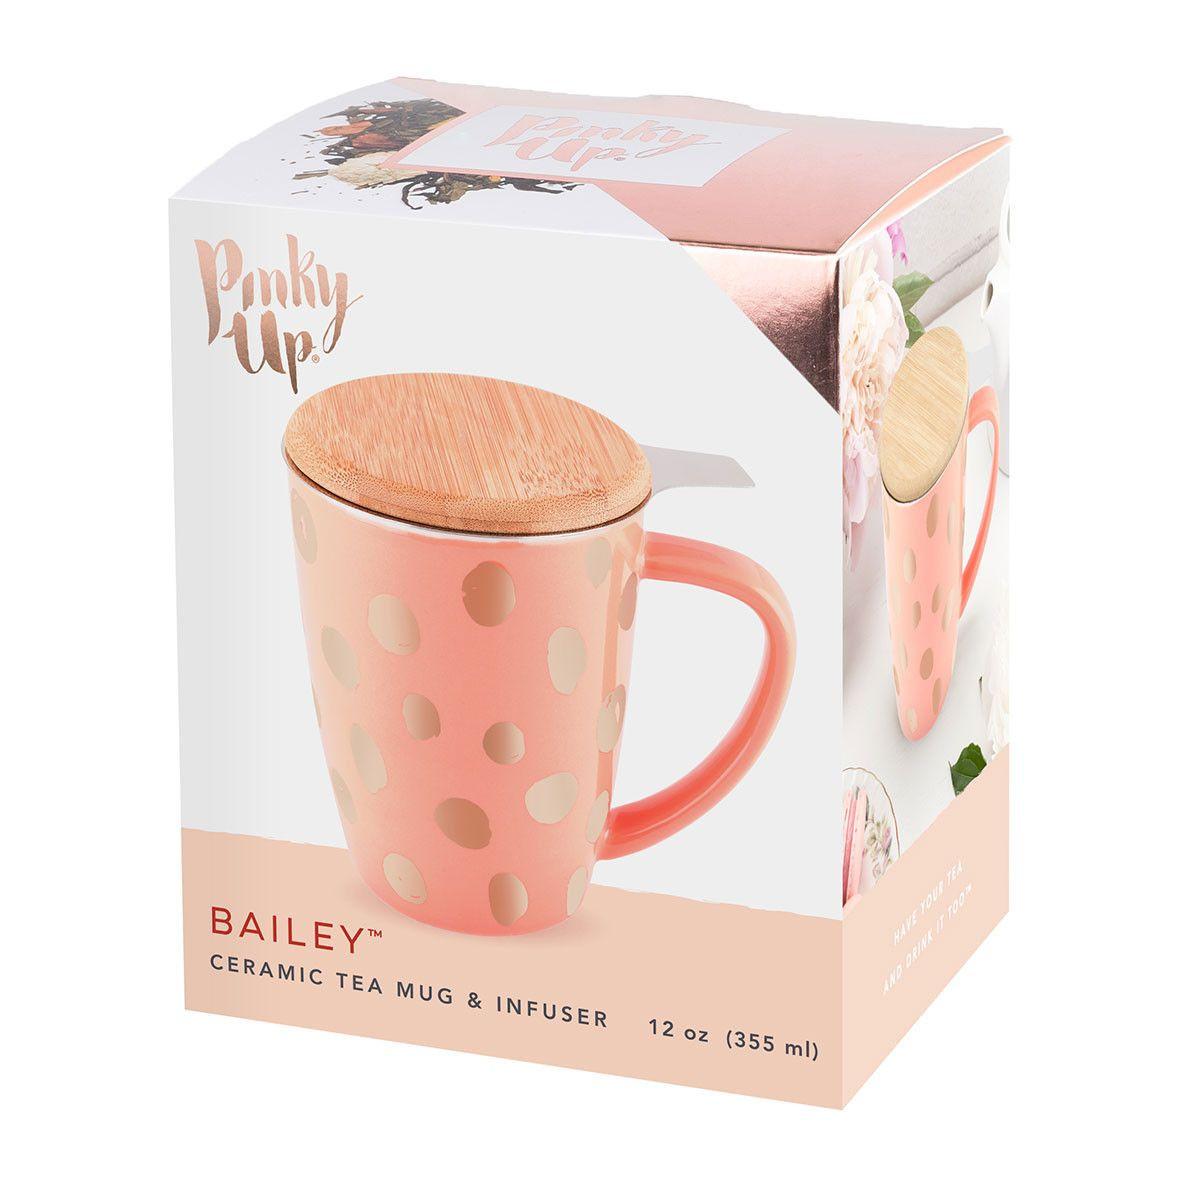 Bailey Peach & Copper Tea Mug and Infuser